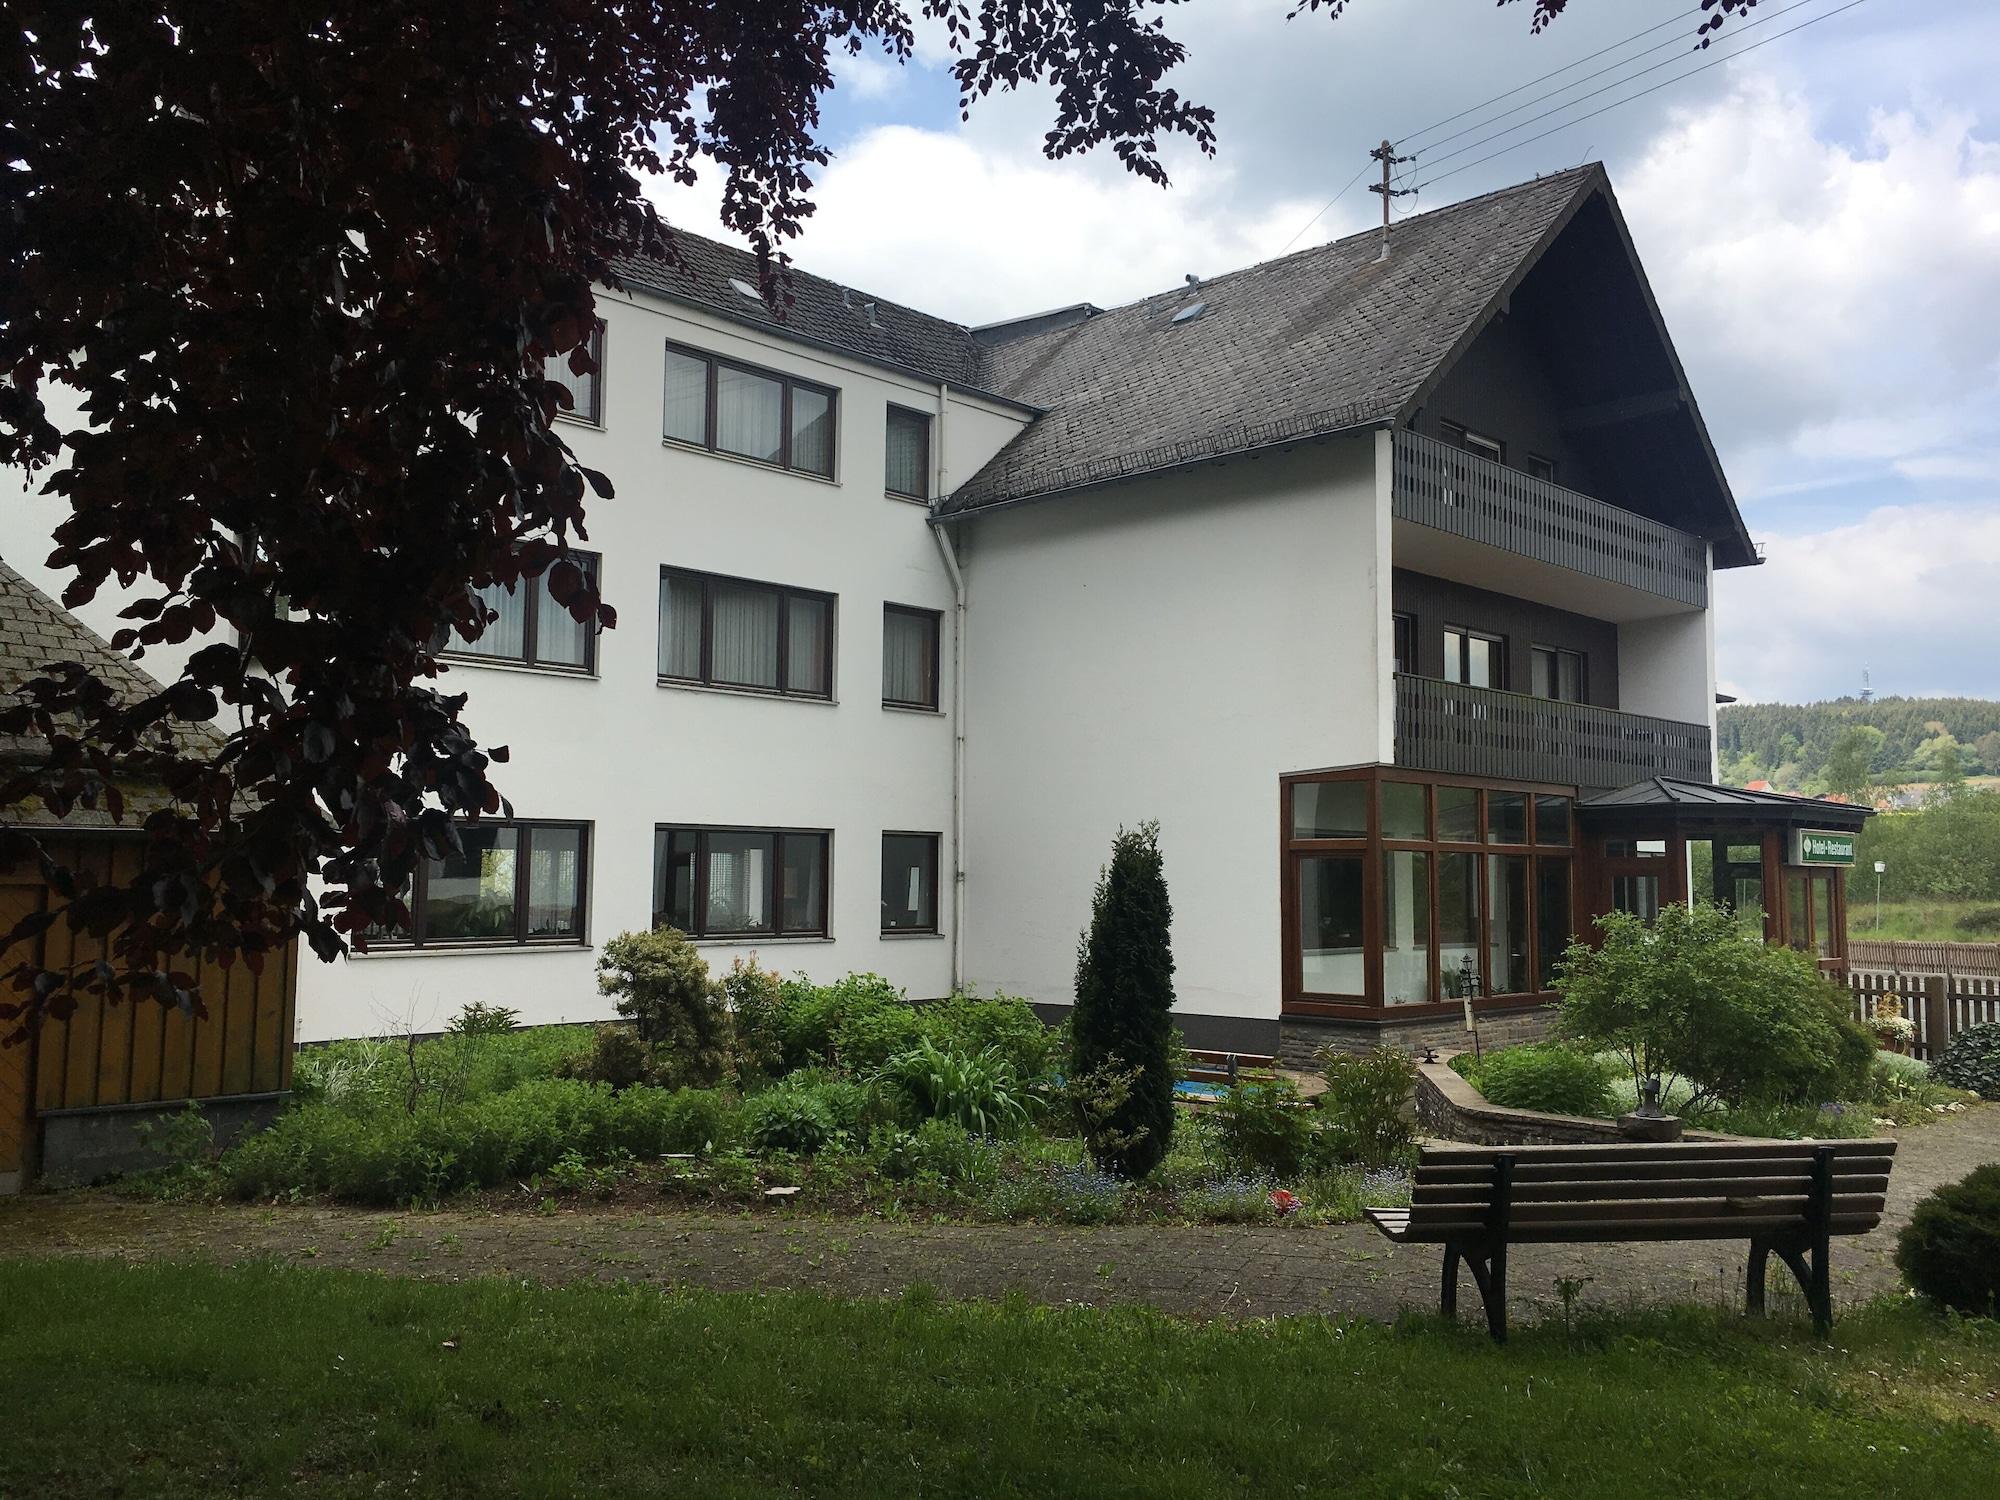 Hotel Pension Haus Kirst, Eifelkreis Bitburg-Prüm